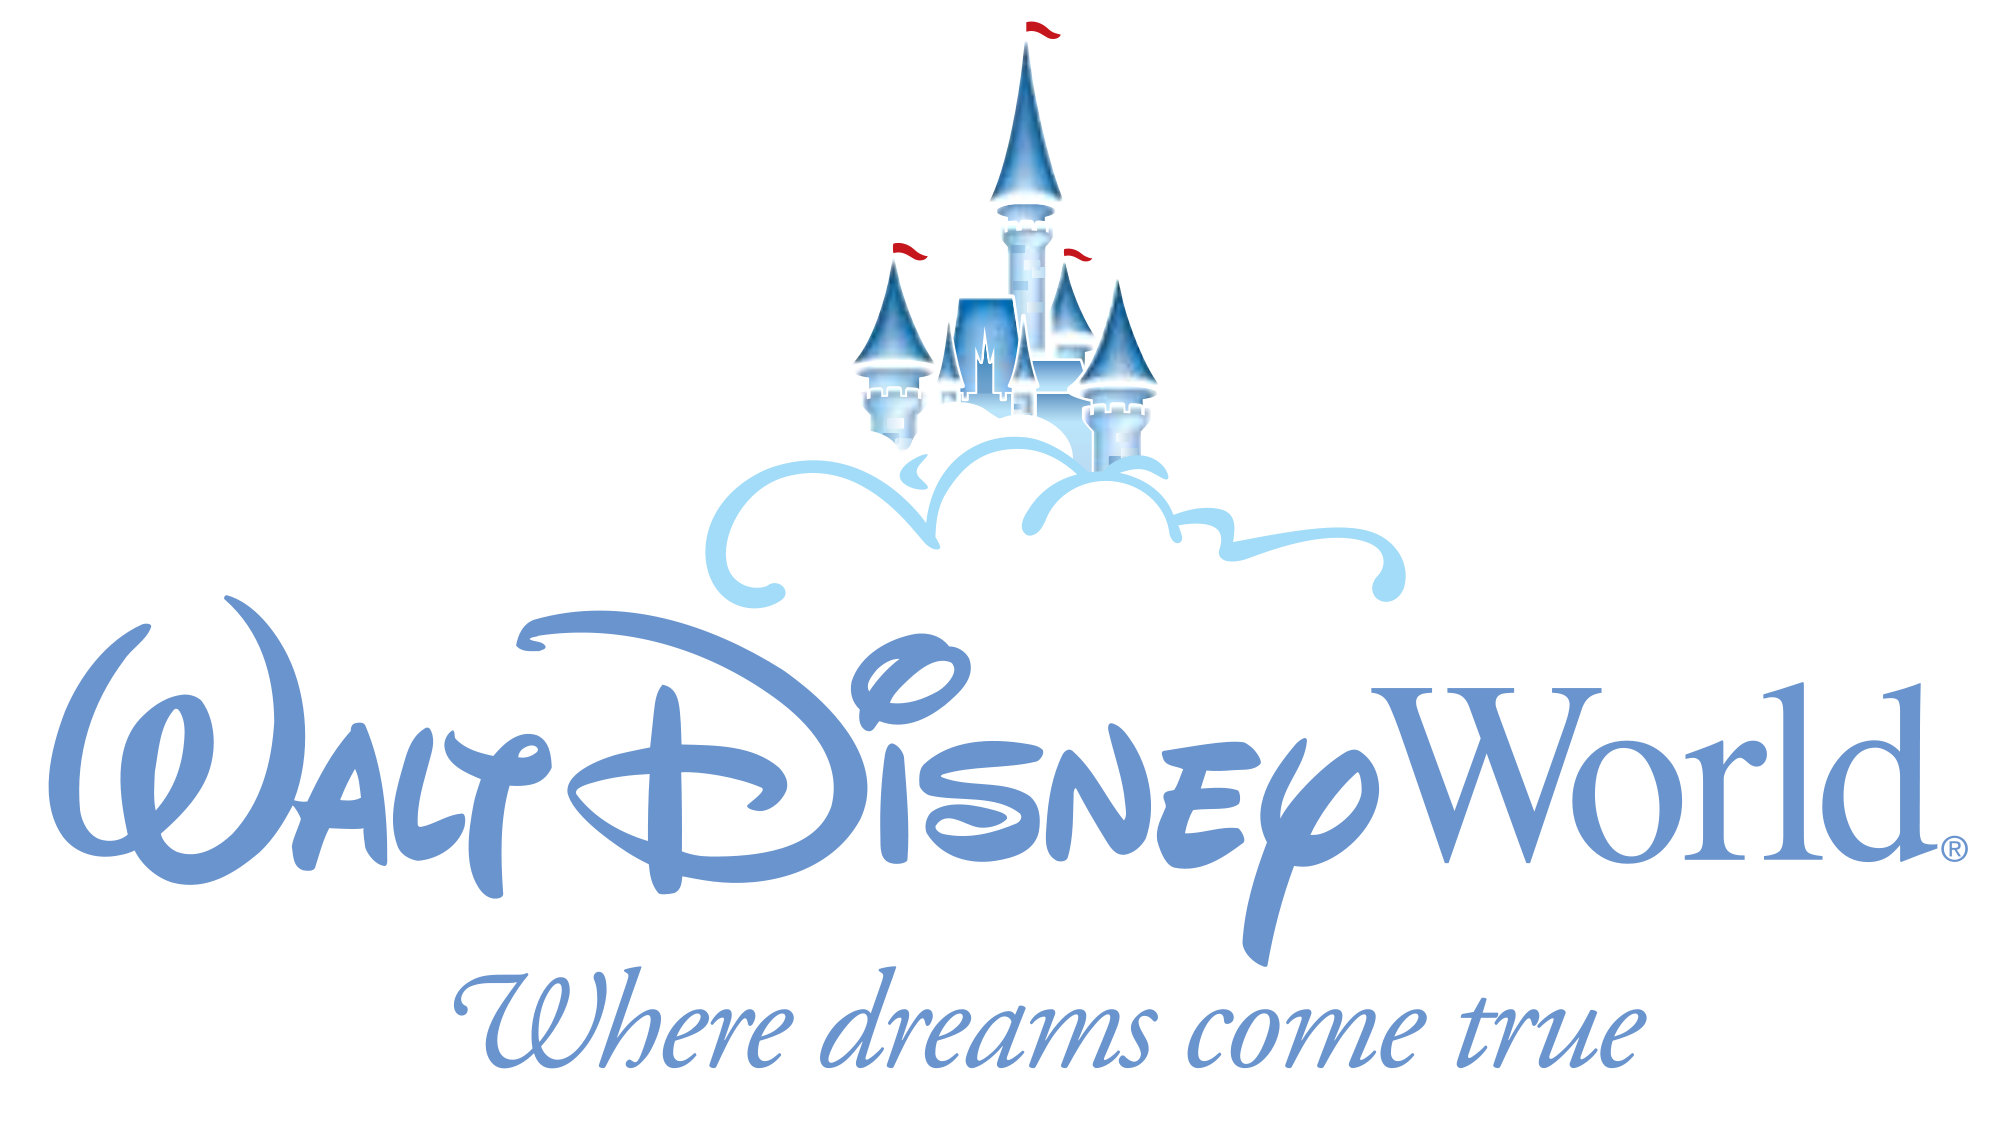 Disneyland clipart font. Image walt disney world